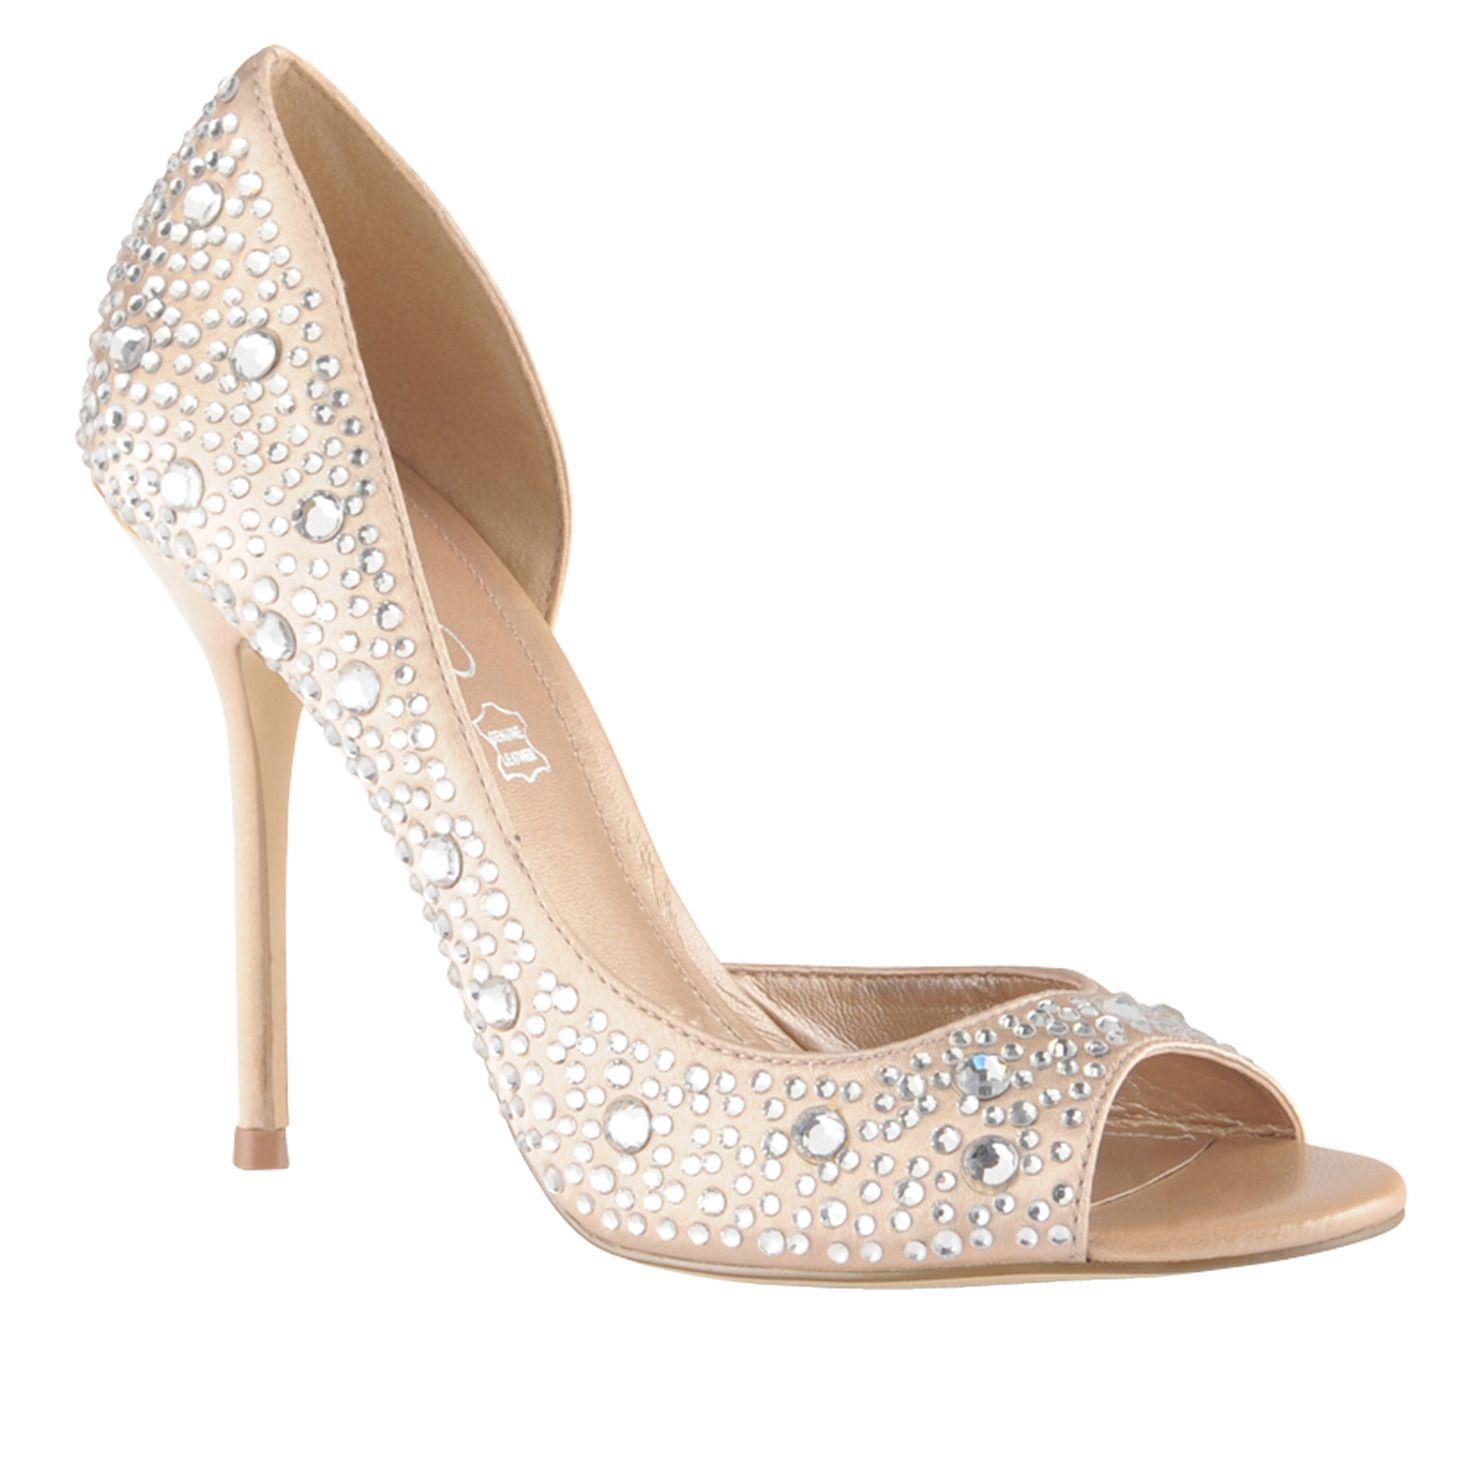 a0379649cf0 ORSINO - women s peep-toe pumps shoes for sale at ALDO Shoes.